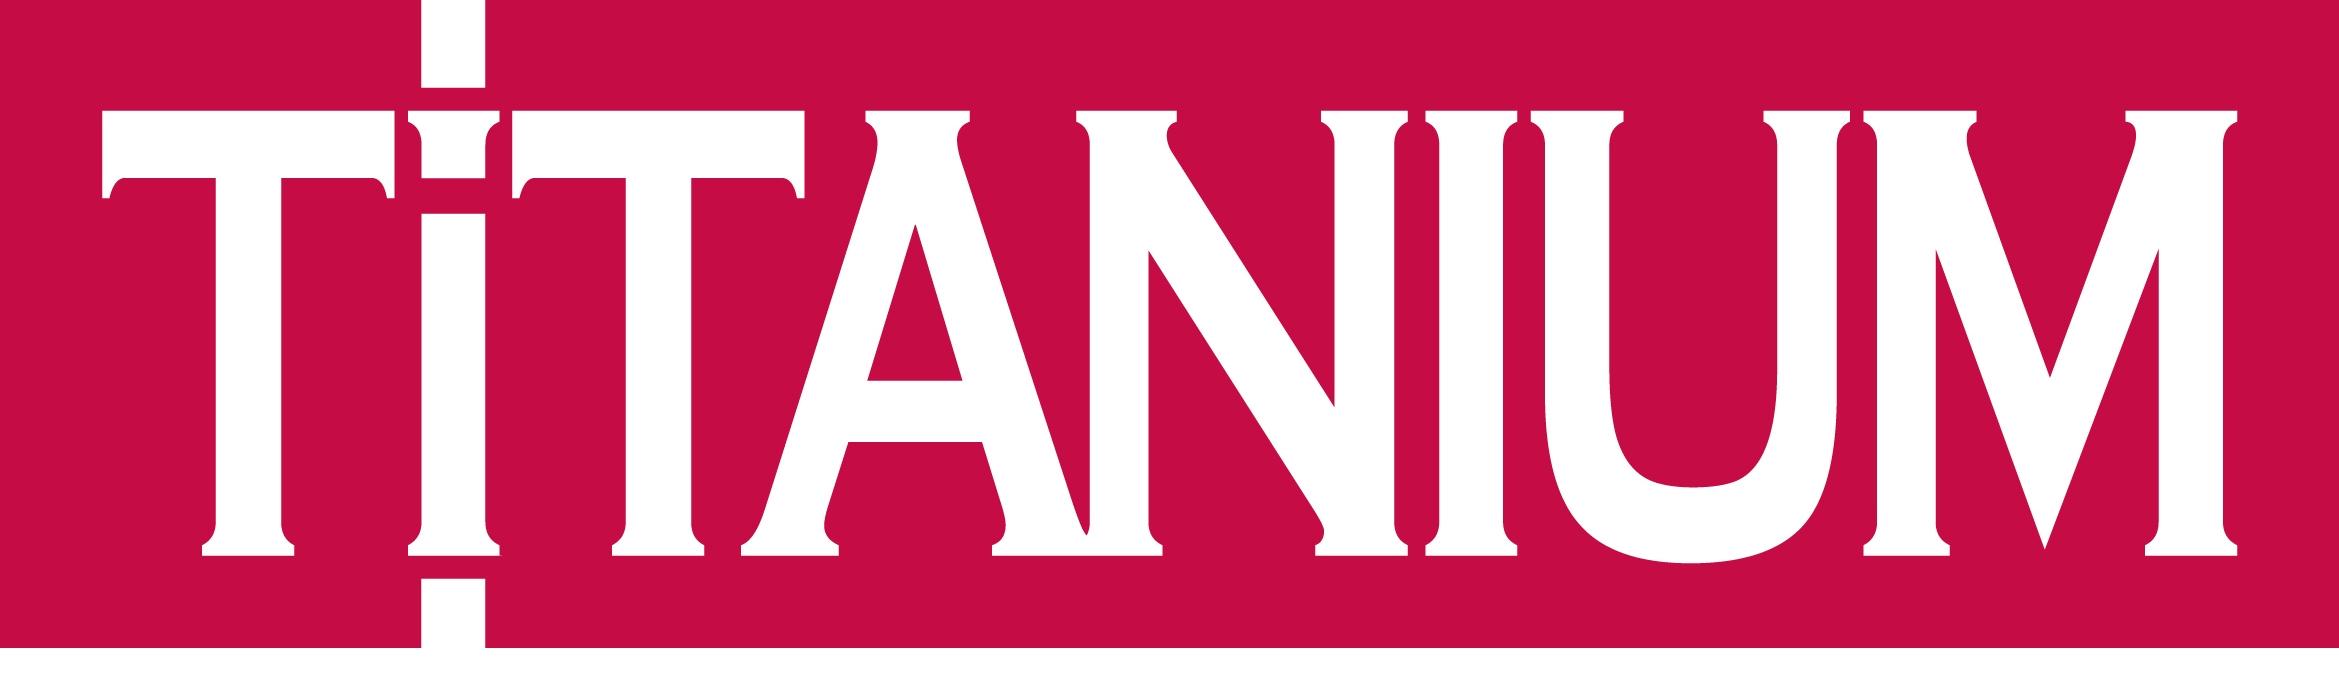 TiTANIUM — International lifestyle magazine